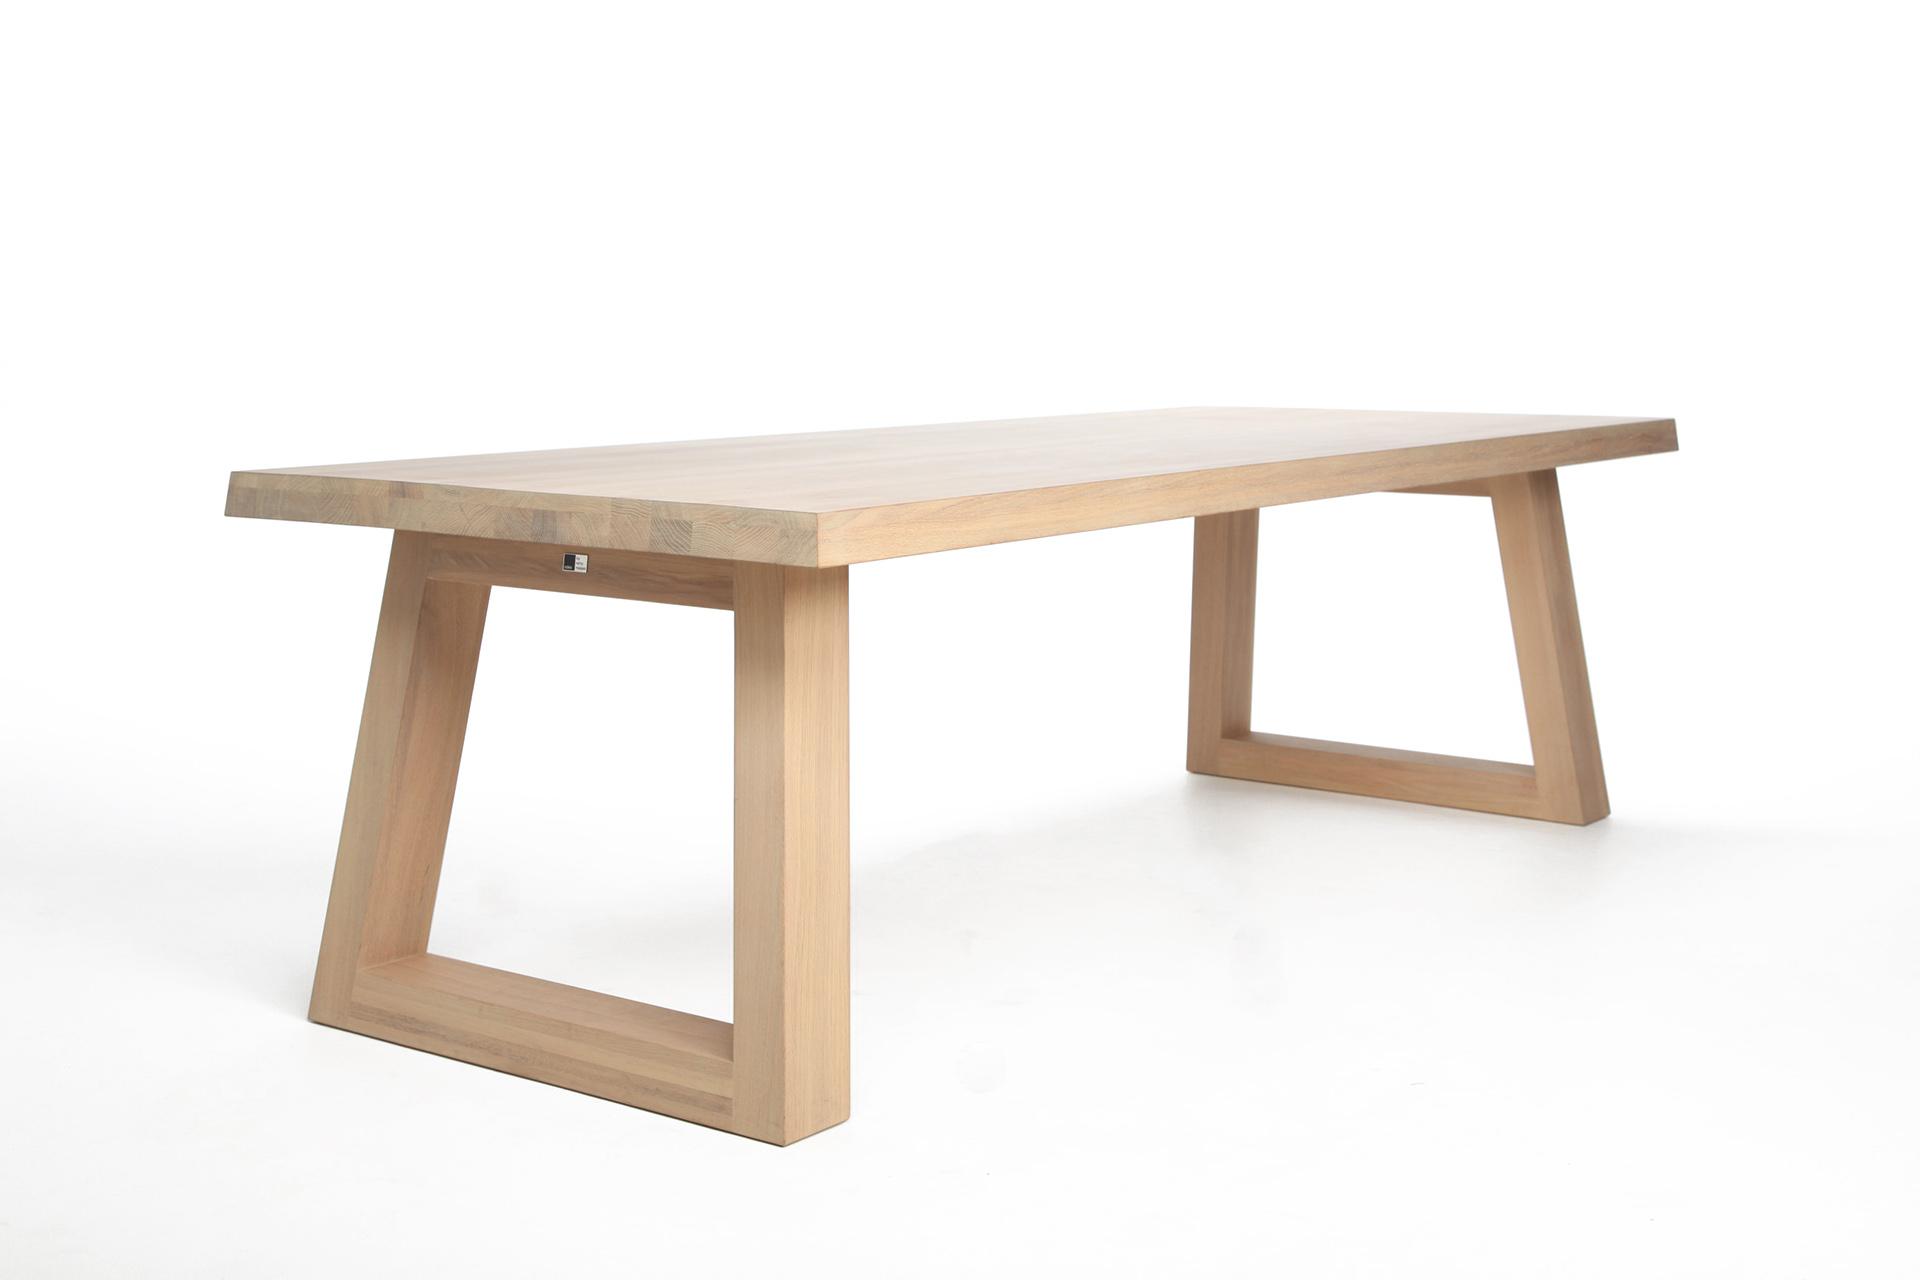 Eettafel Extra Lang.Design Eettafel Slide L Remy Meijers L Odesi Your Dutch Design